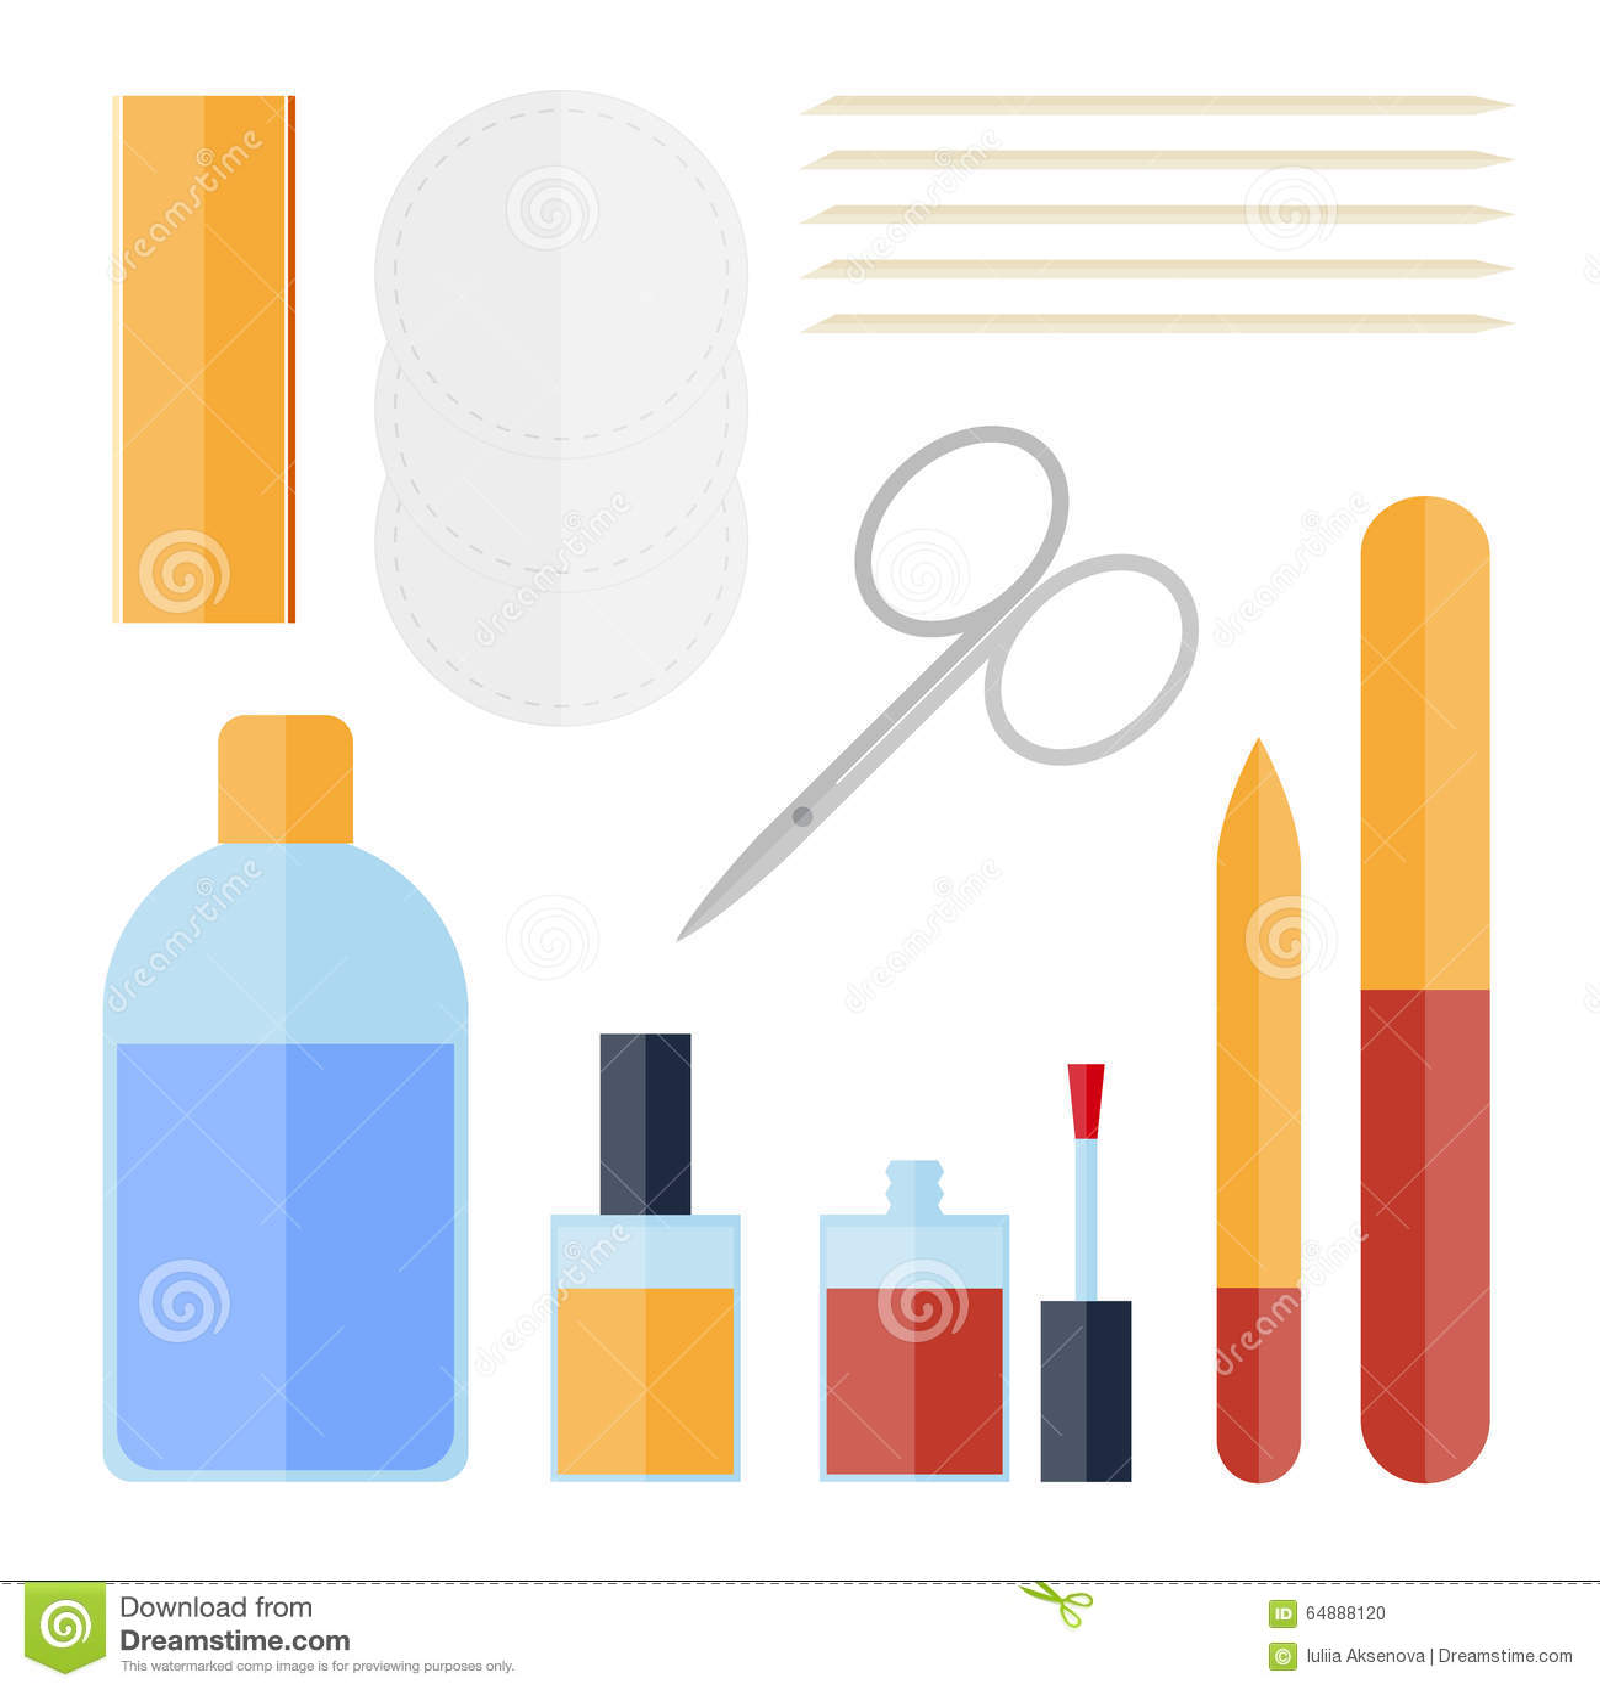 Lean Manufacturing Tool Kit (A – L)